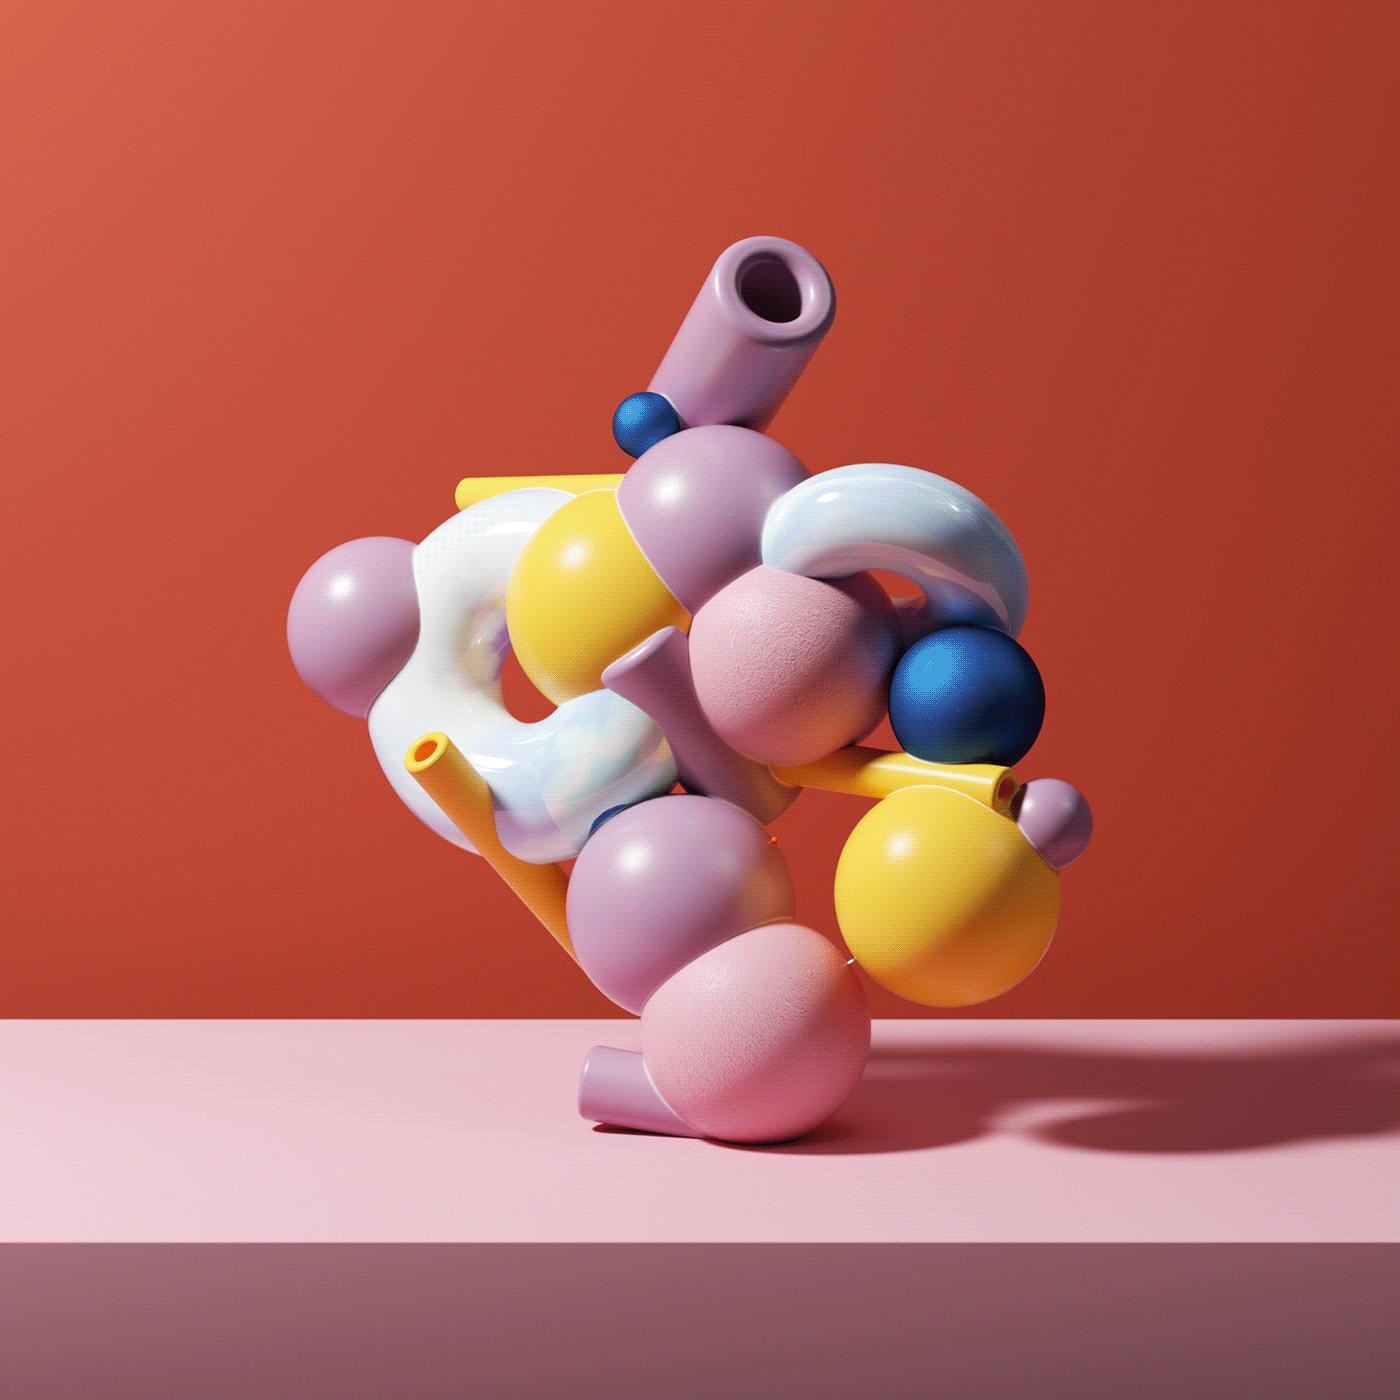 Image may contain: orange, cartoon and balloon